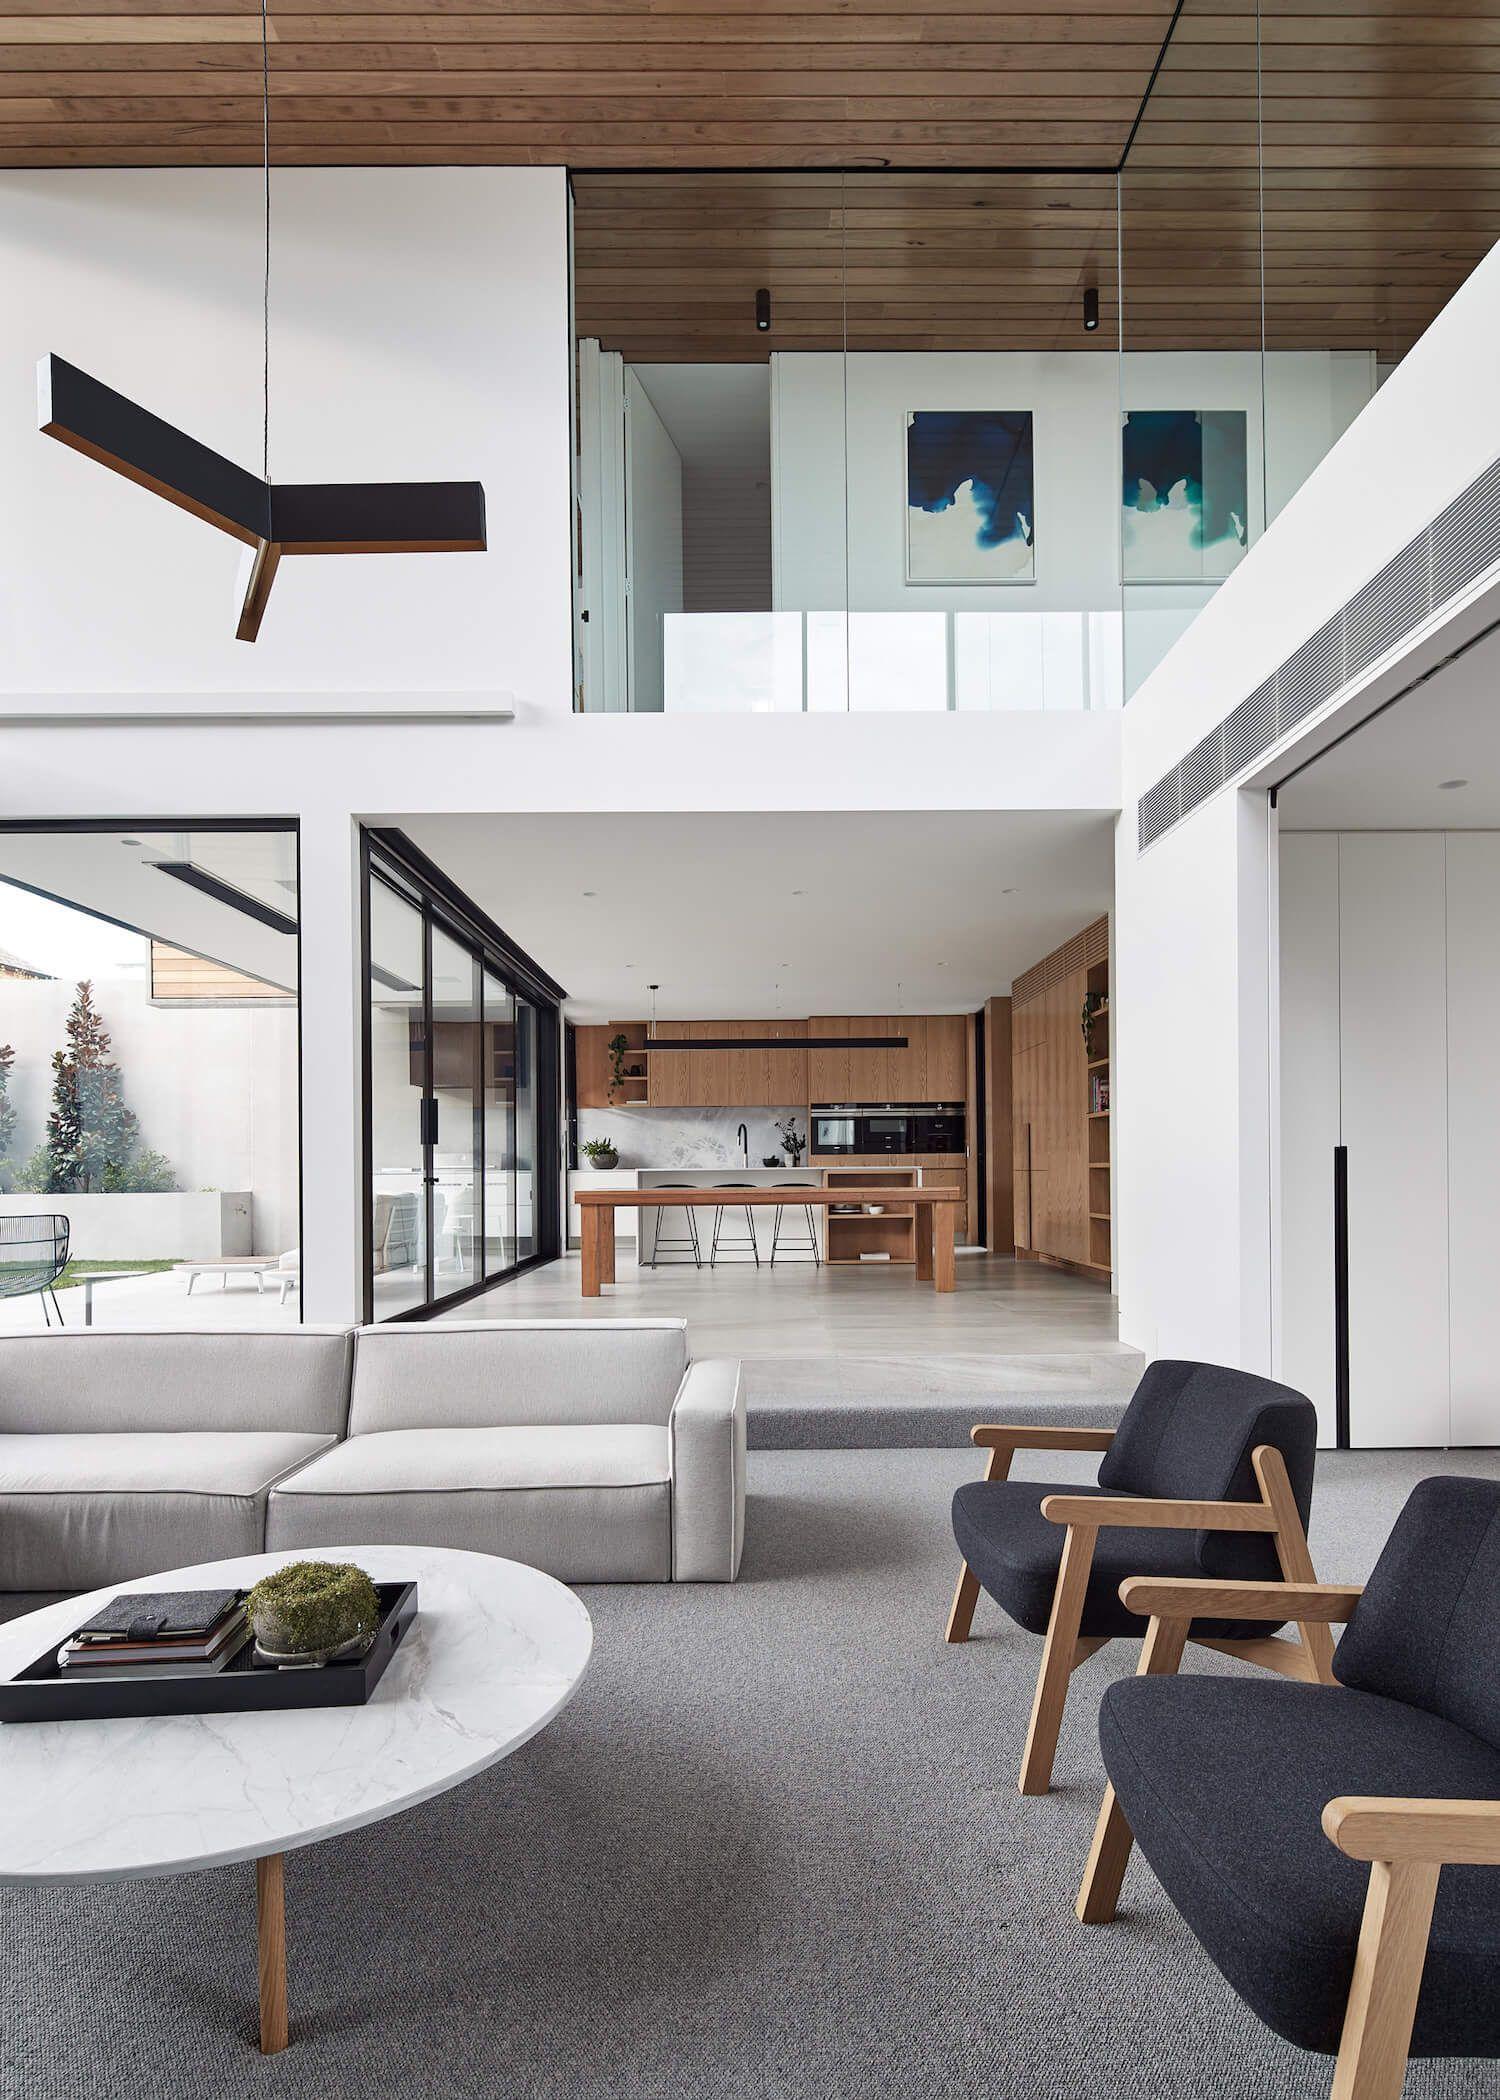 30 Inspiring Home Interior Decorating Ideas Modern House Design